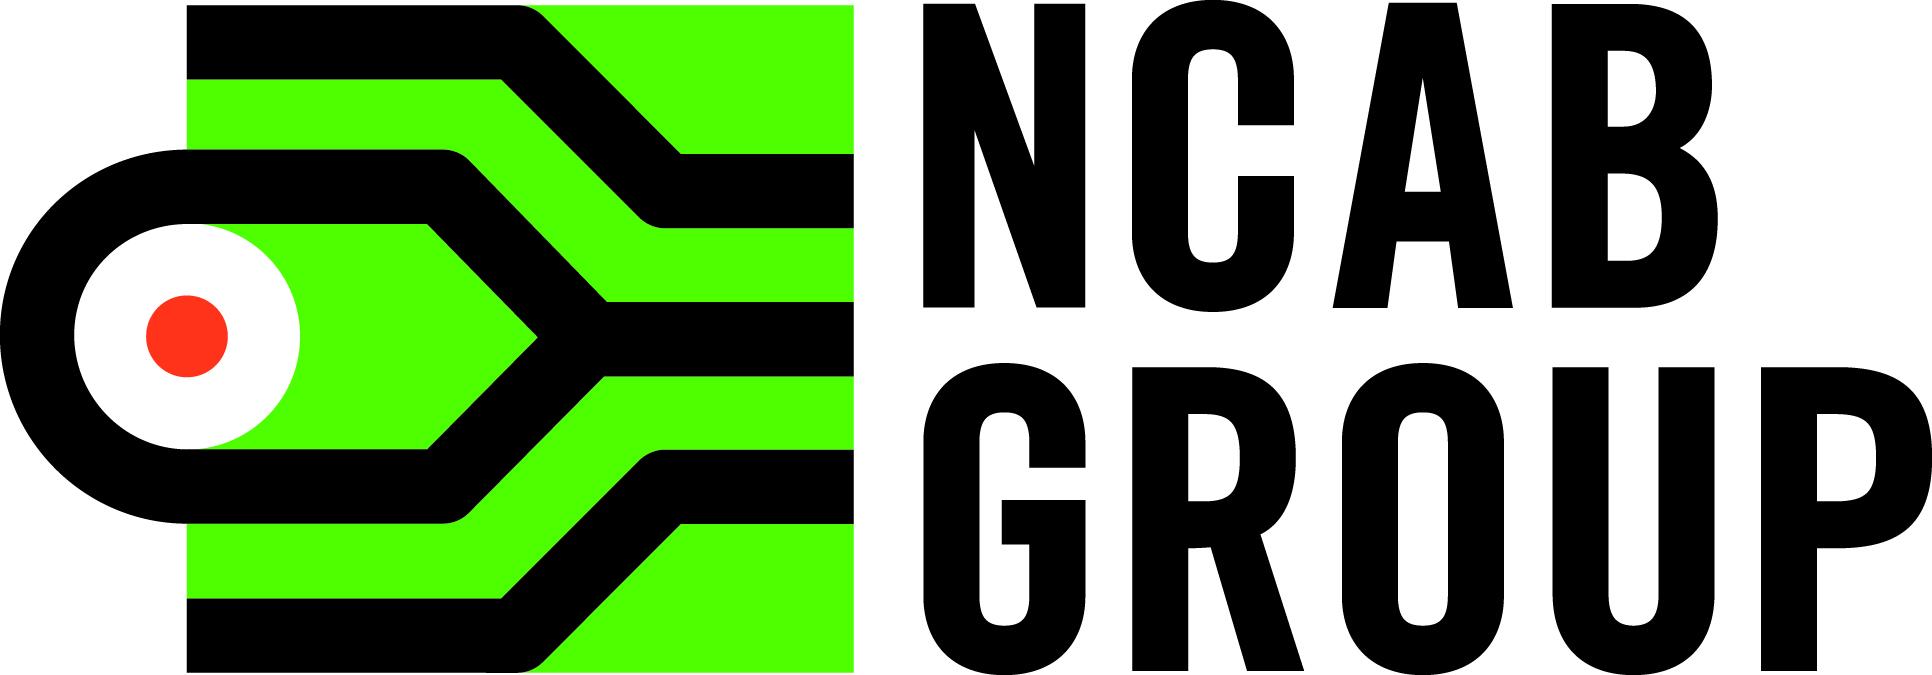 ncab-logo-without-byline-print.jpg